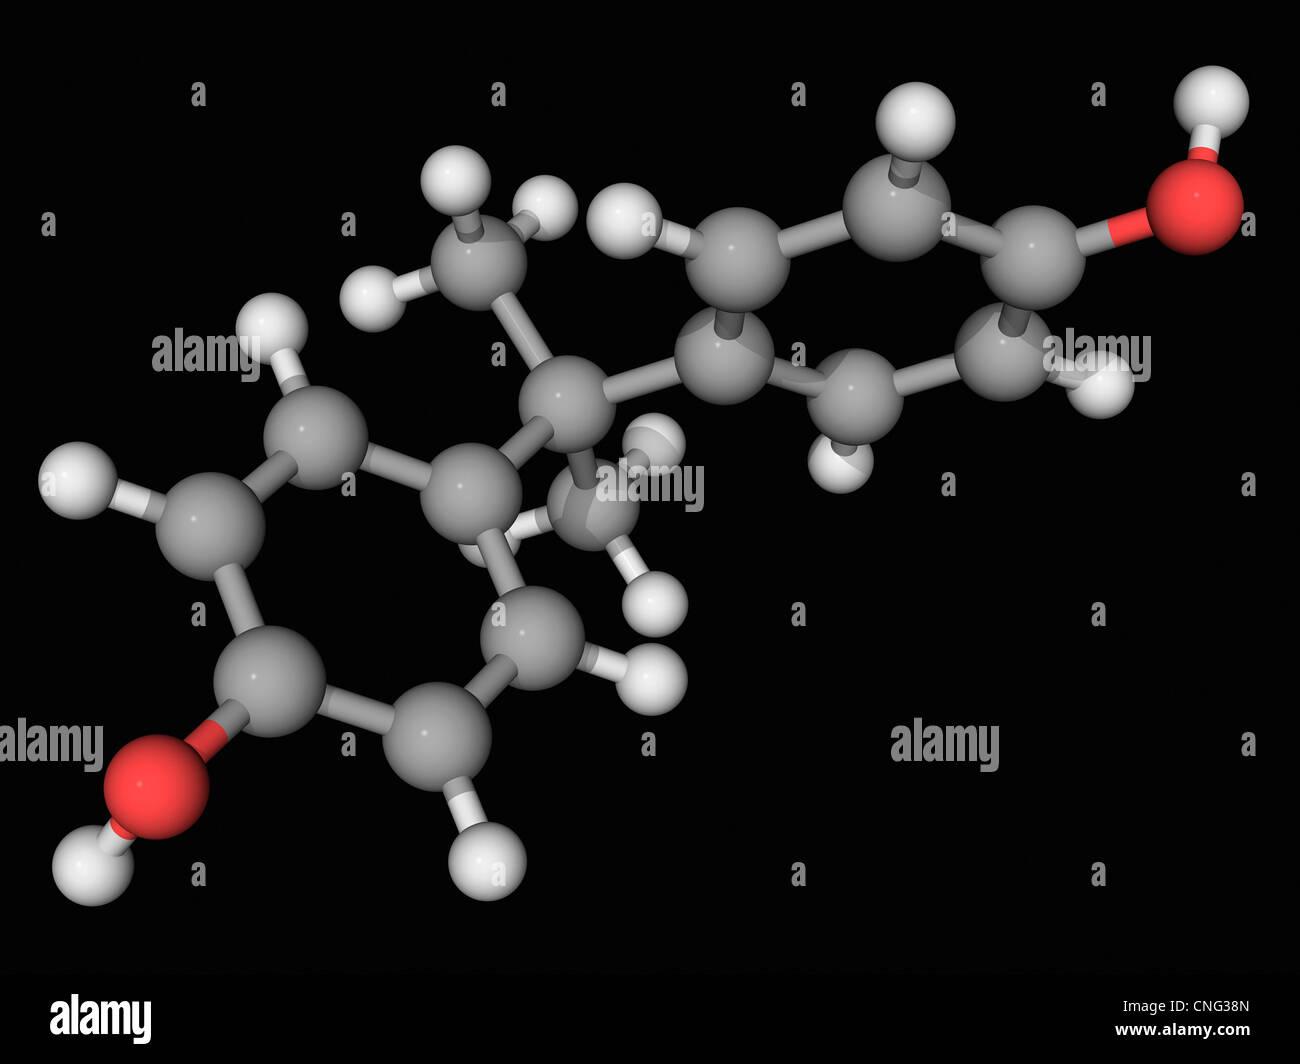 Bisphenol A molecule - Stock Image